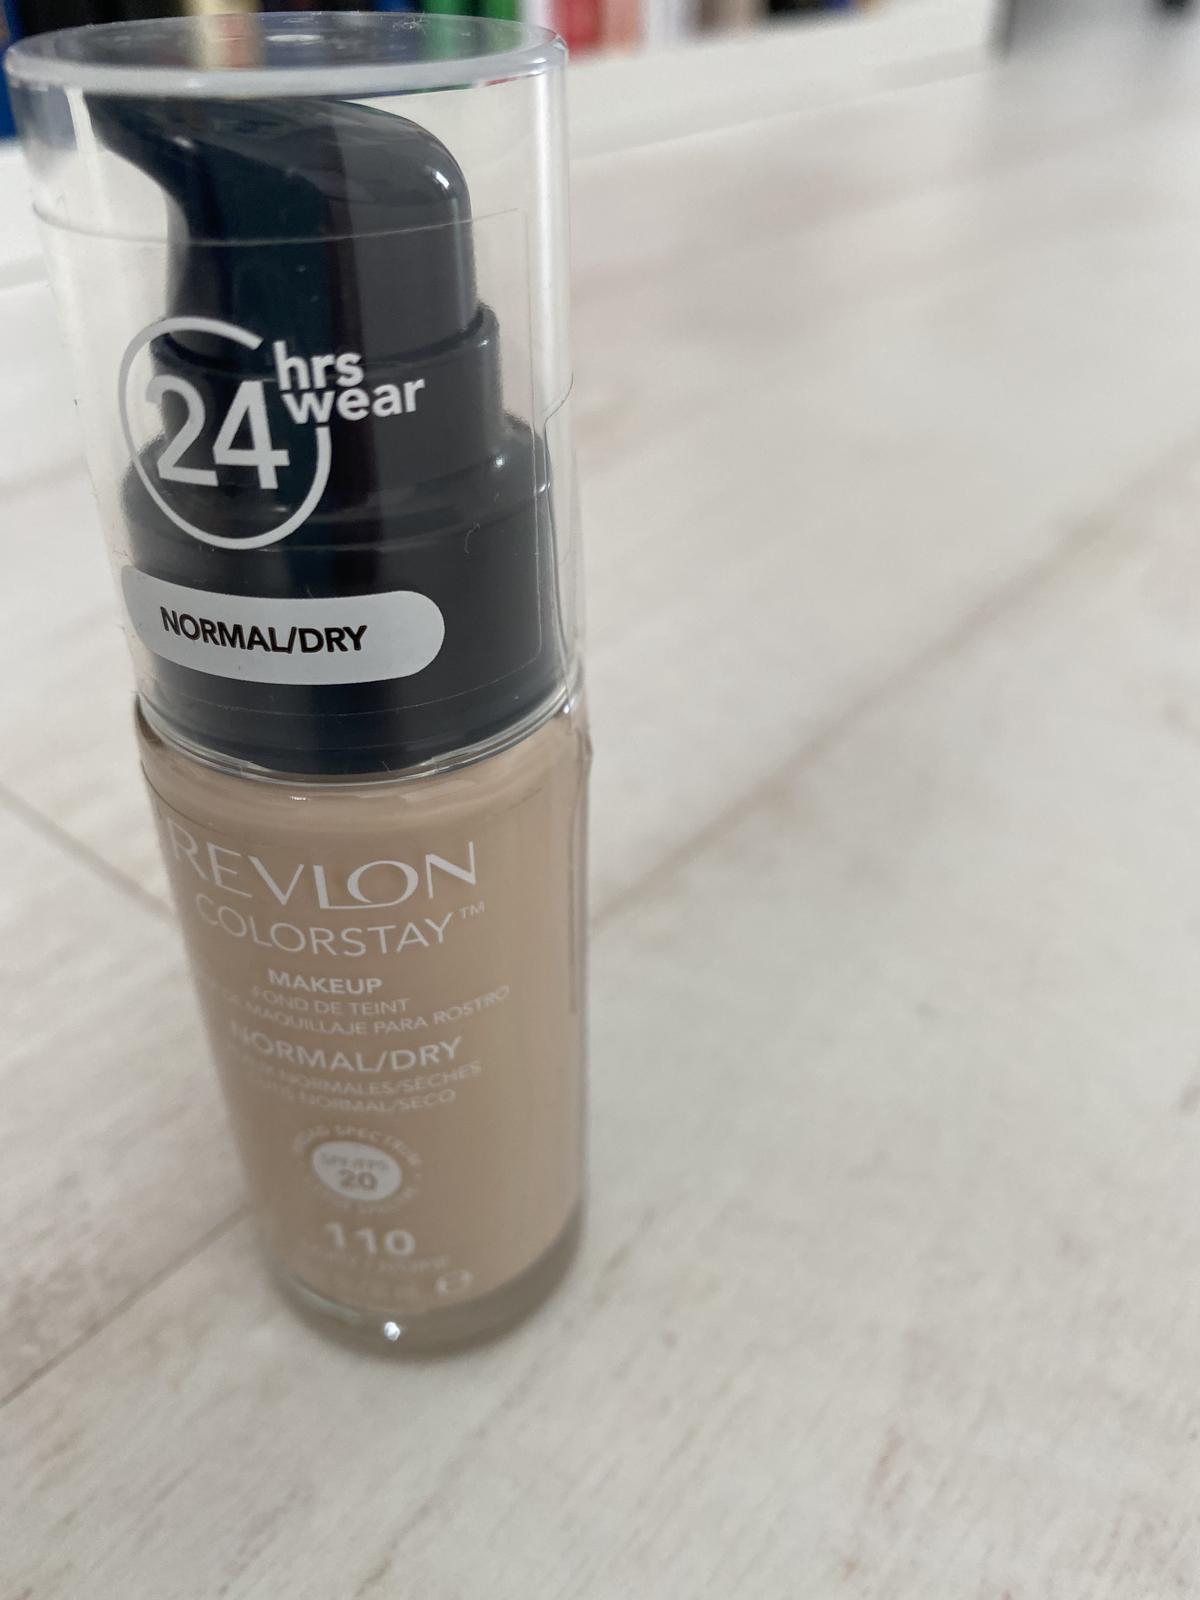 Makeup zn. revlon  - nepoužitý - Obrázok č. 1